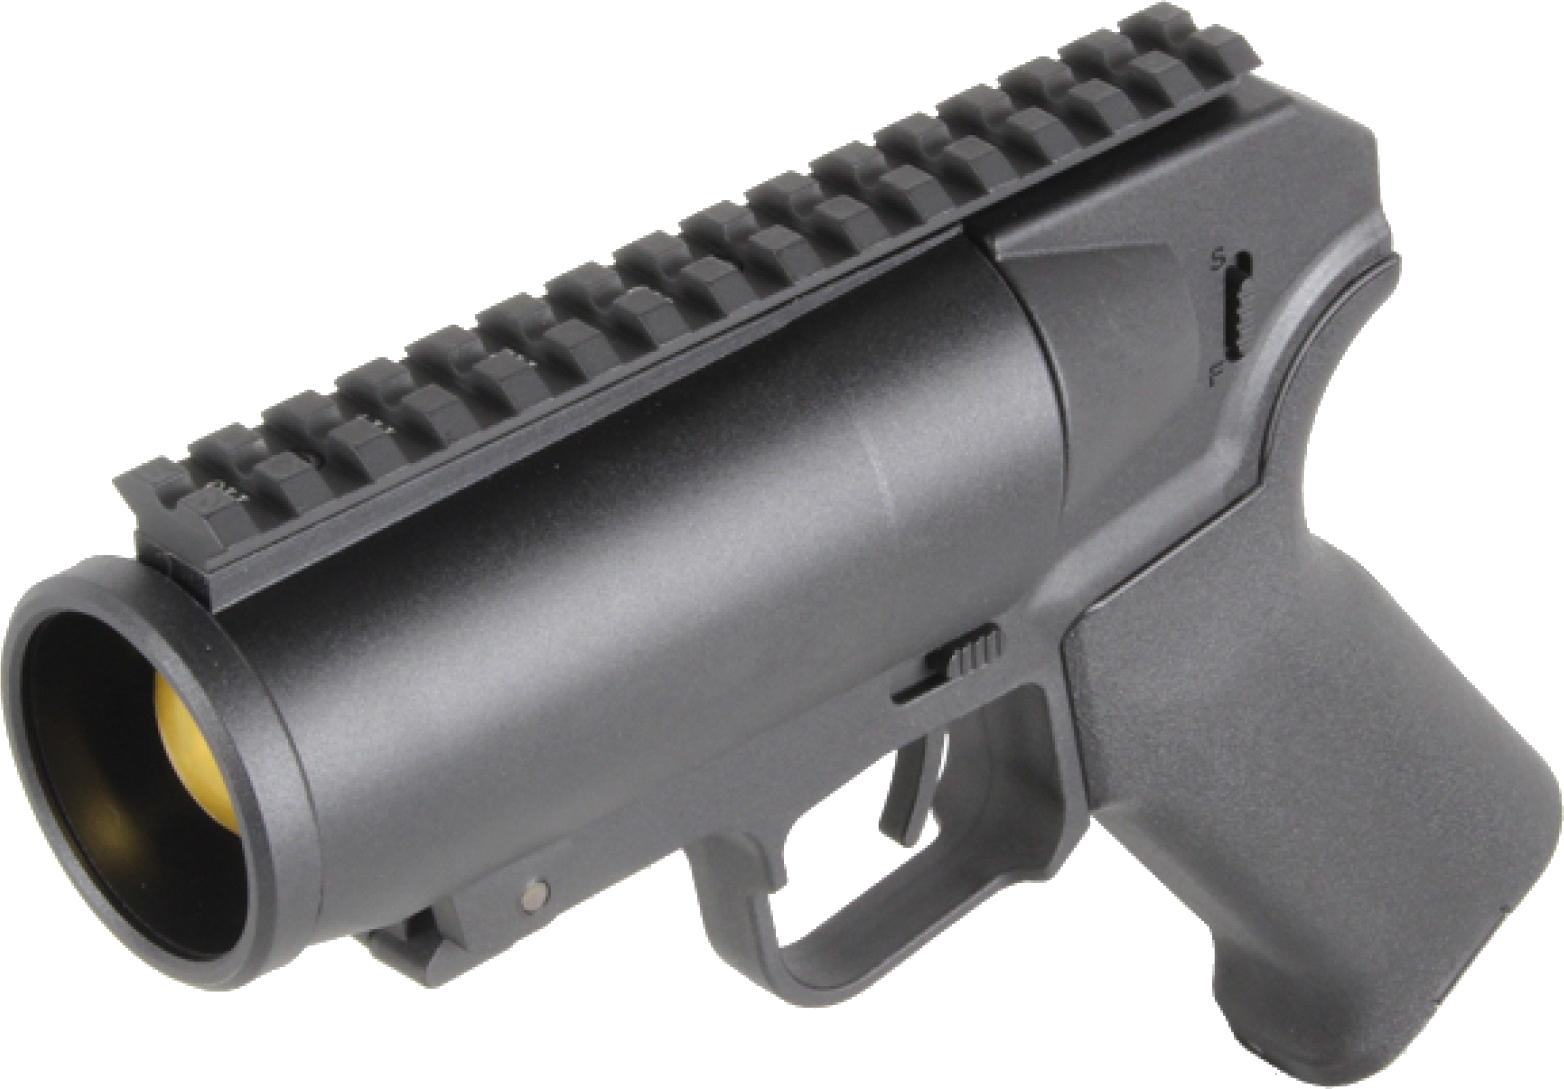 mini grenade launcher PNG Image